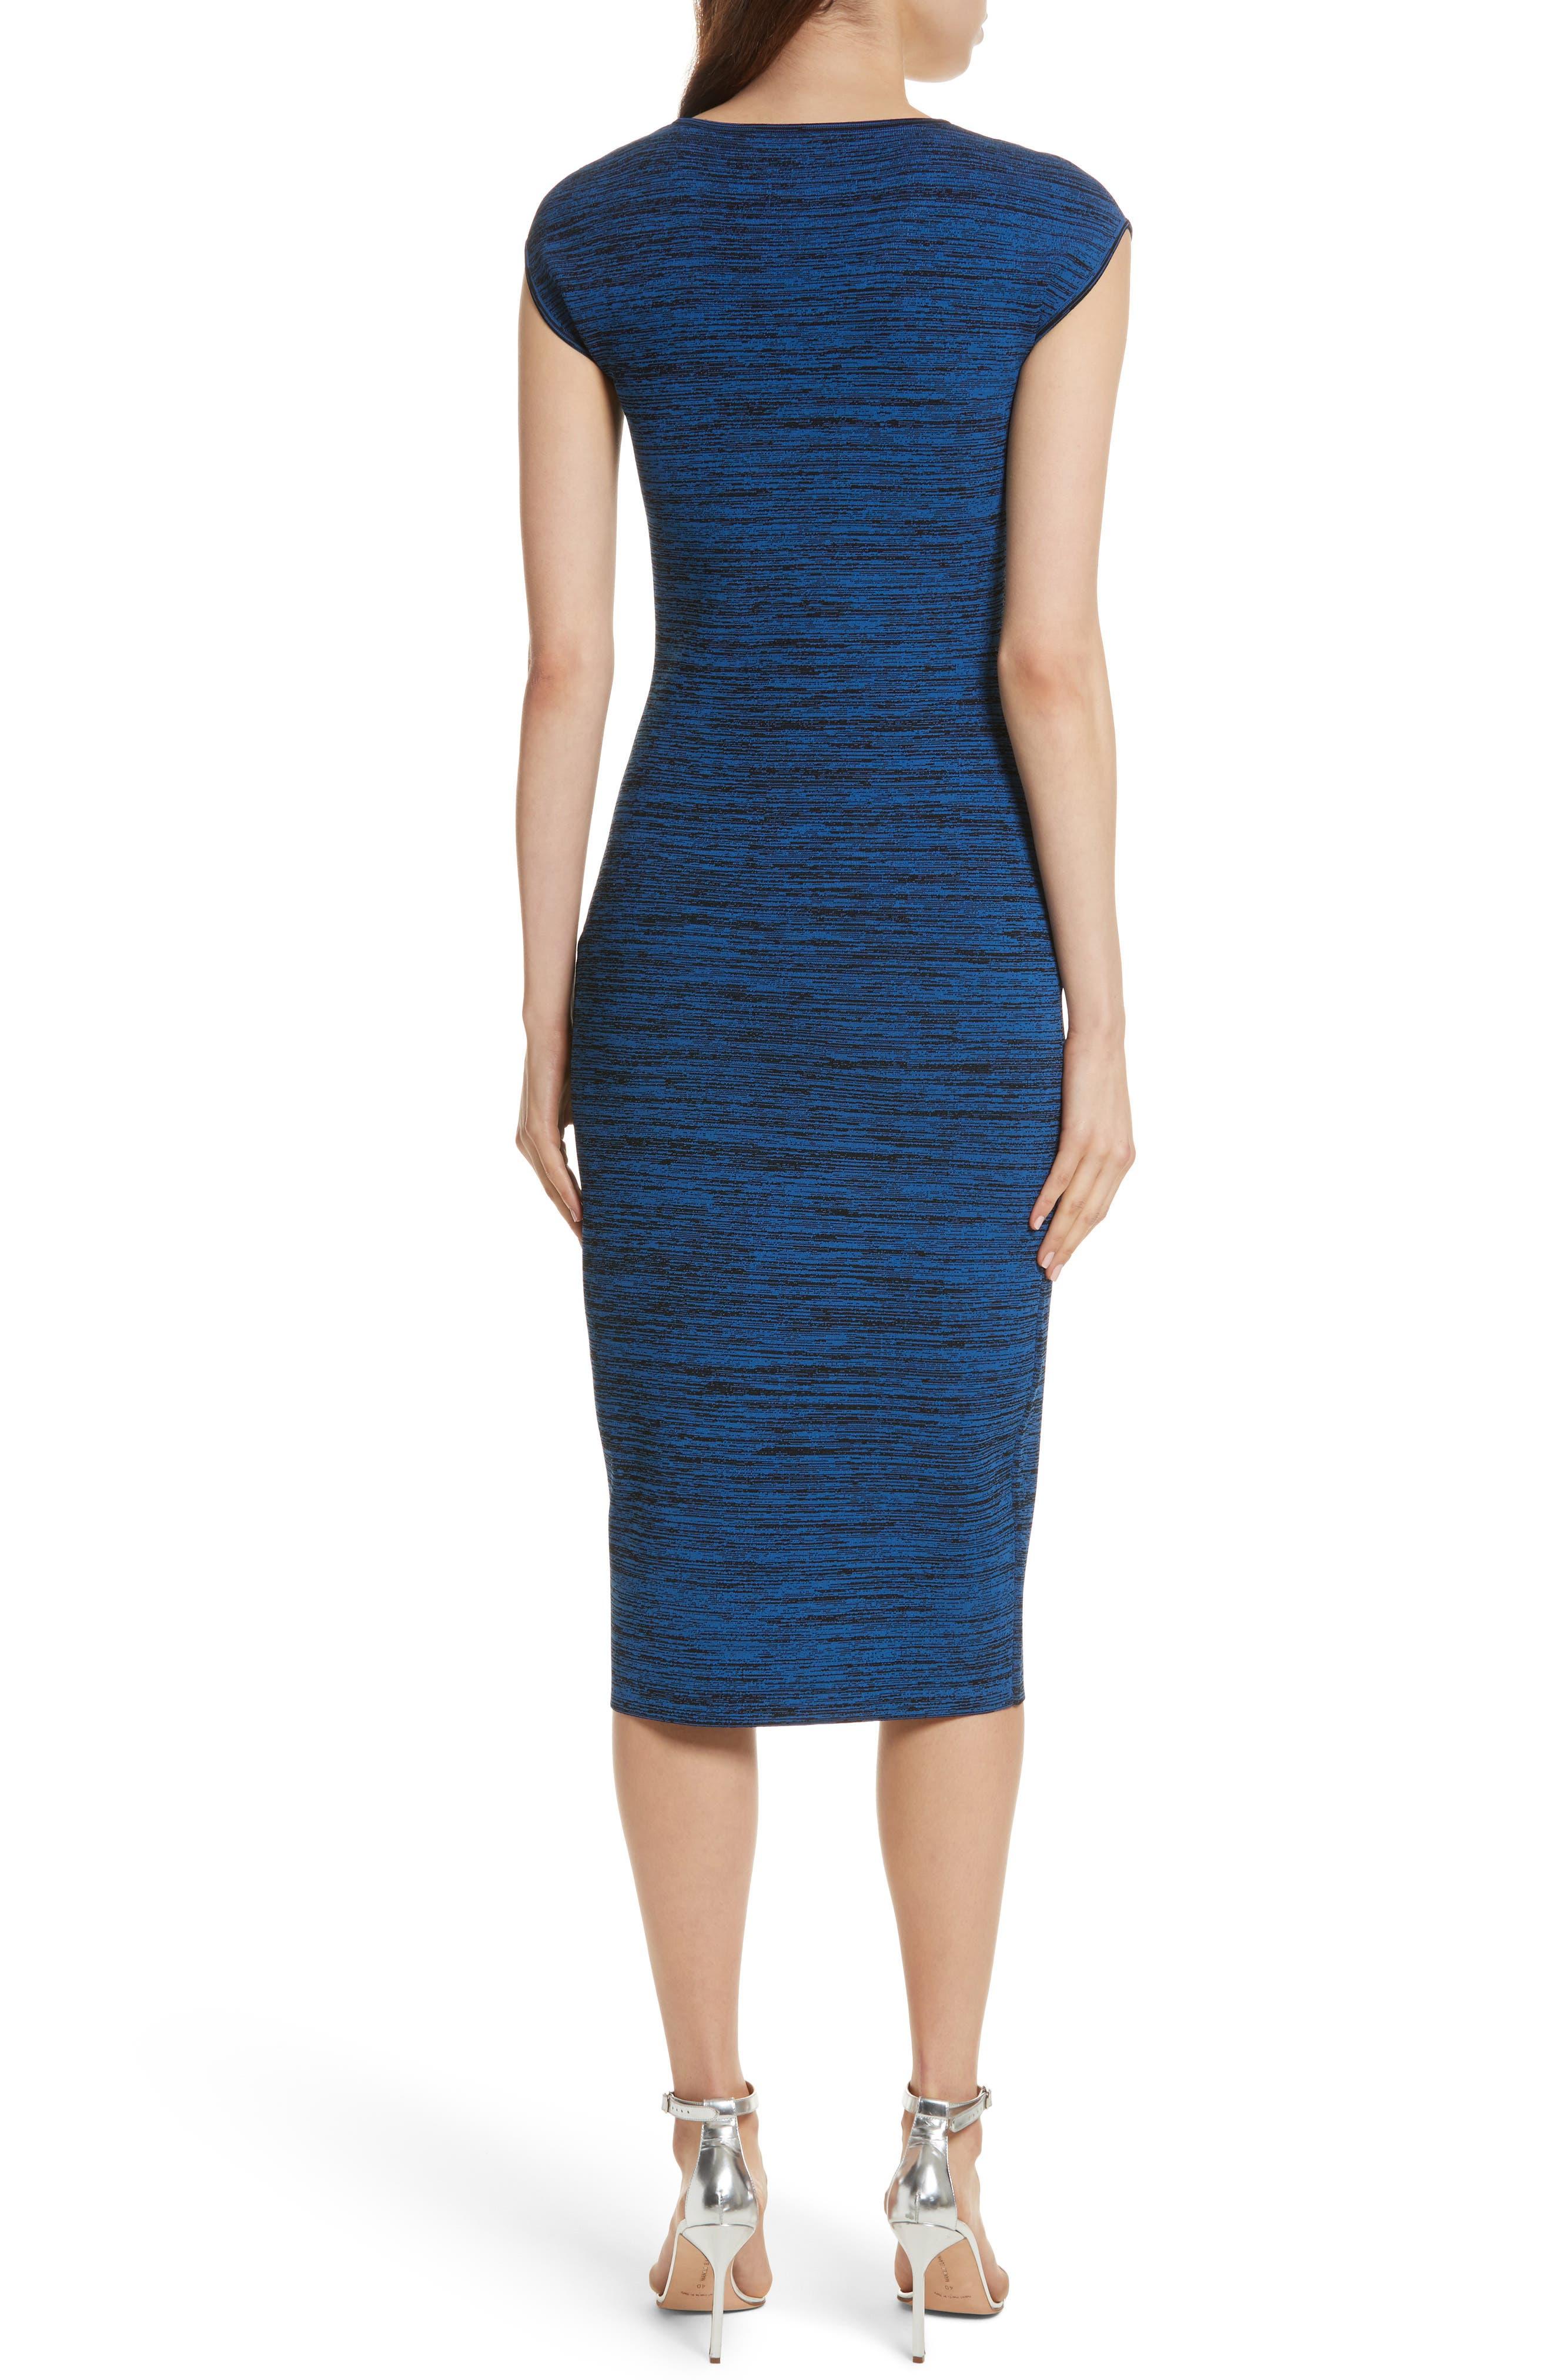 Diane von Furstenberg Sweater Dress,                             Alternate thumbnail 2, color,                             429